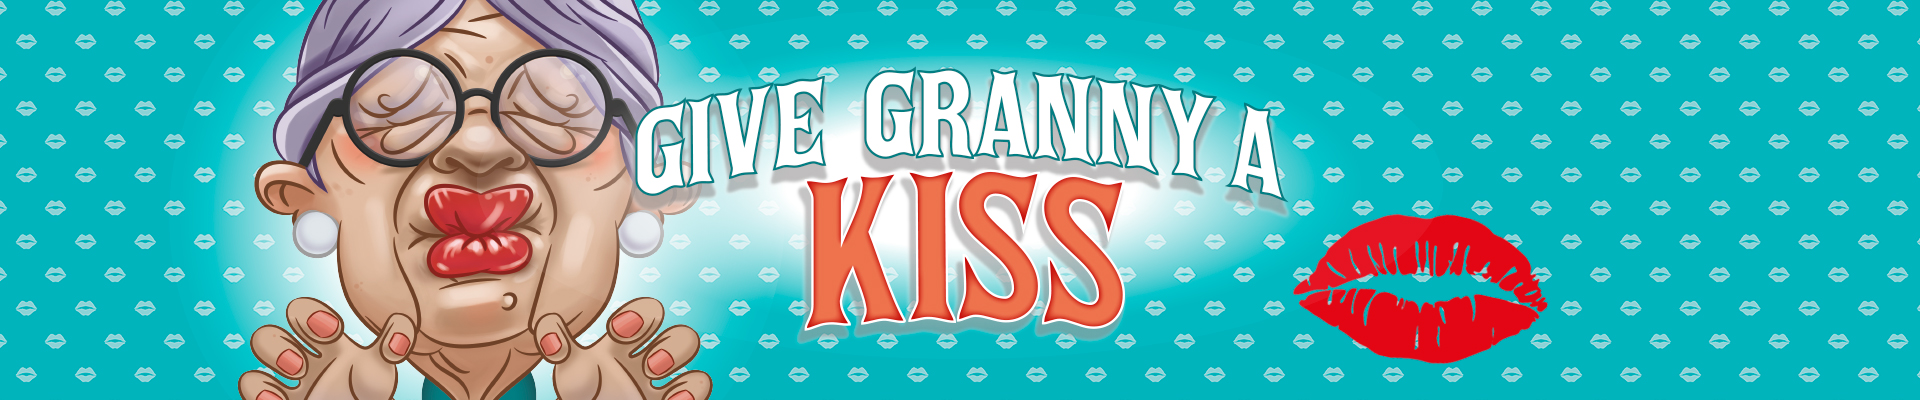 Give Granny A Kiss